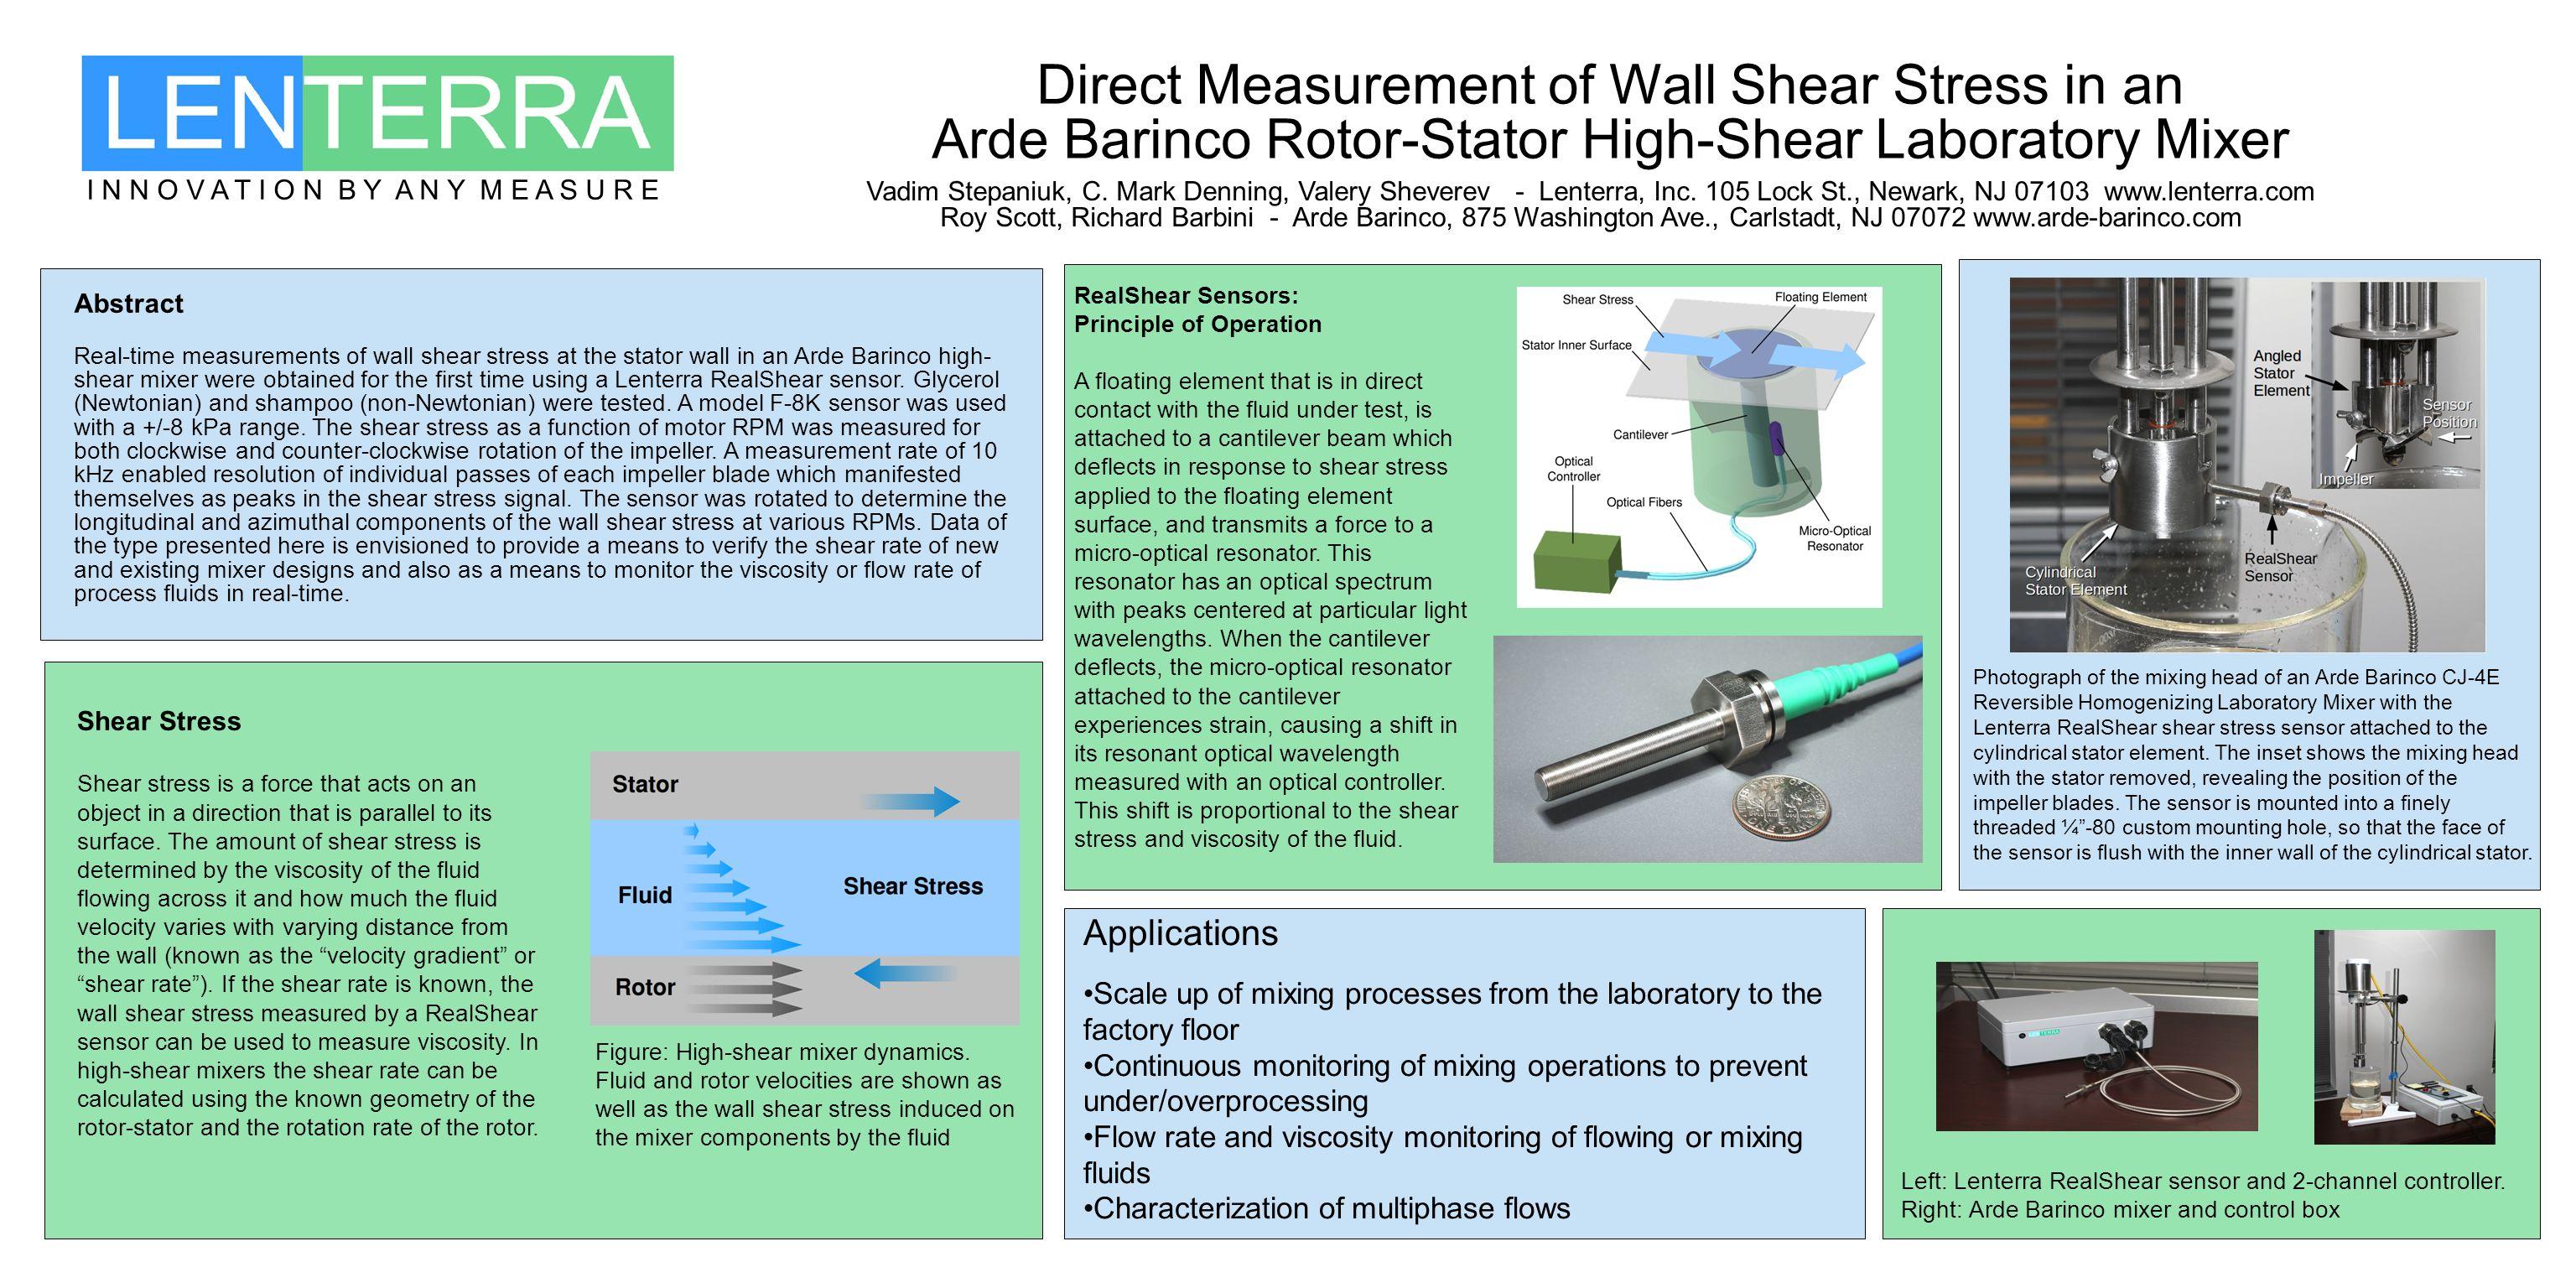 I N N O V A T I O N B Y A N Y M E A S U R E Direct Measurement of Wall Shear Stress in an Arde Barinco Rotor-Stator High-Shear Laboratory Mixer Vadim